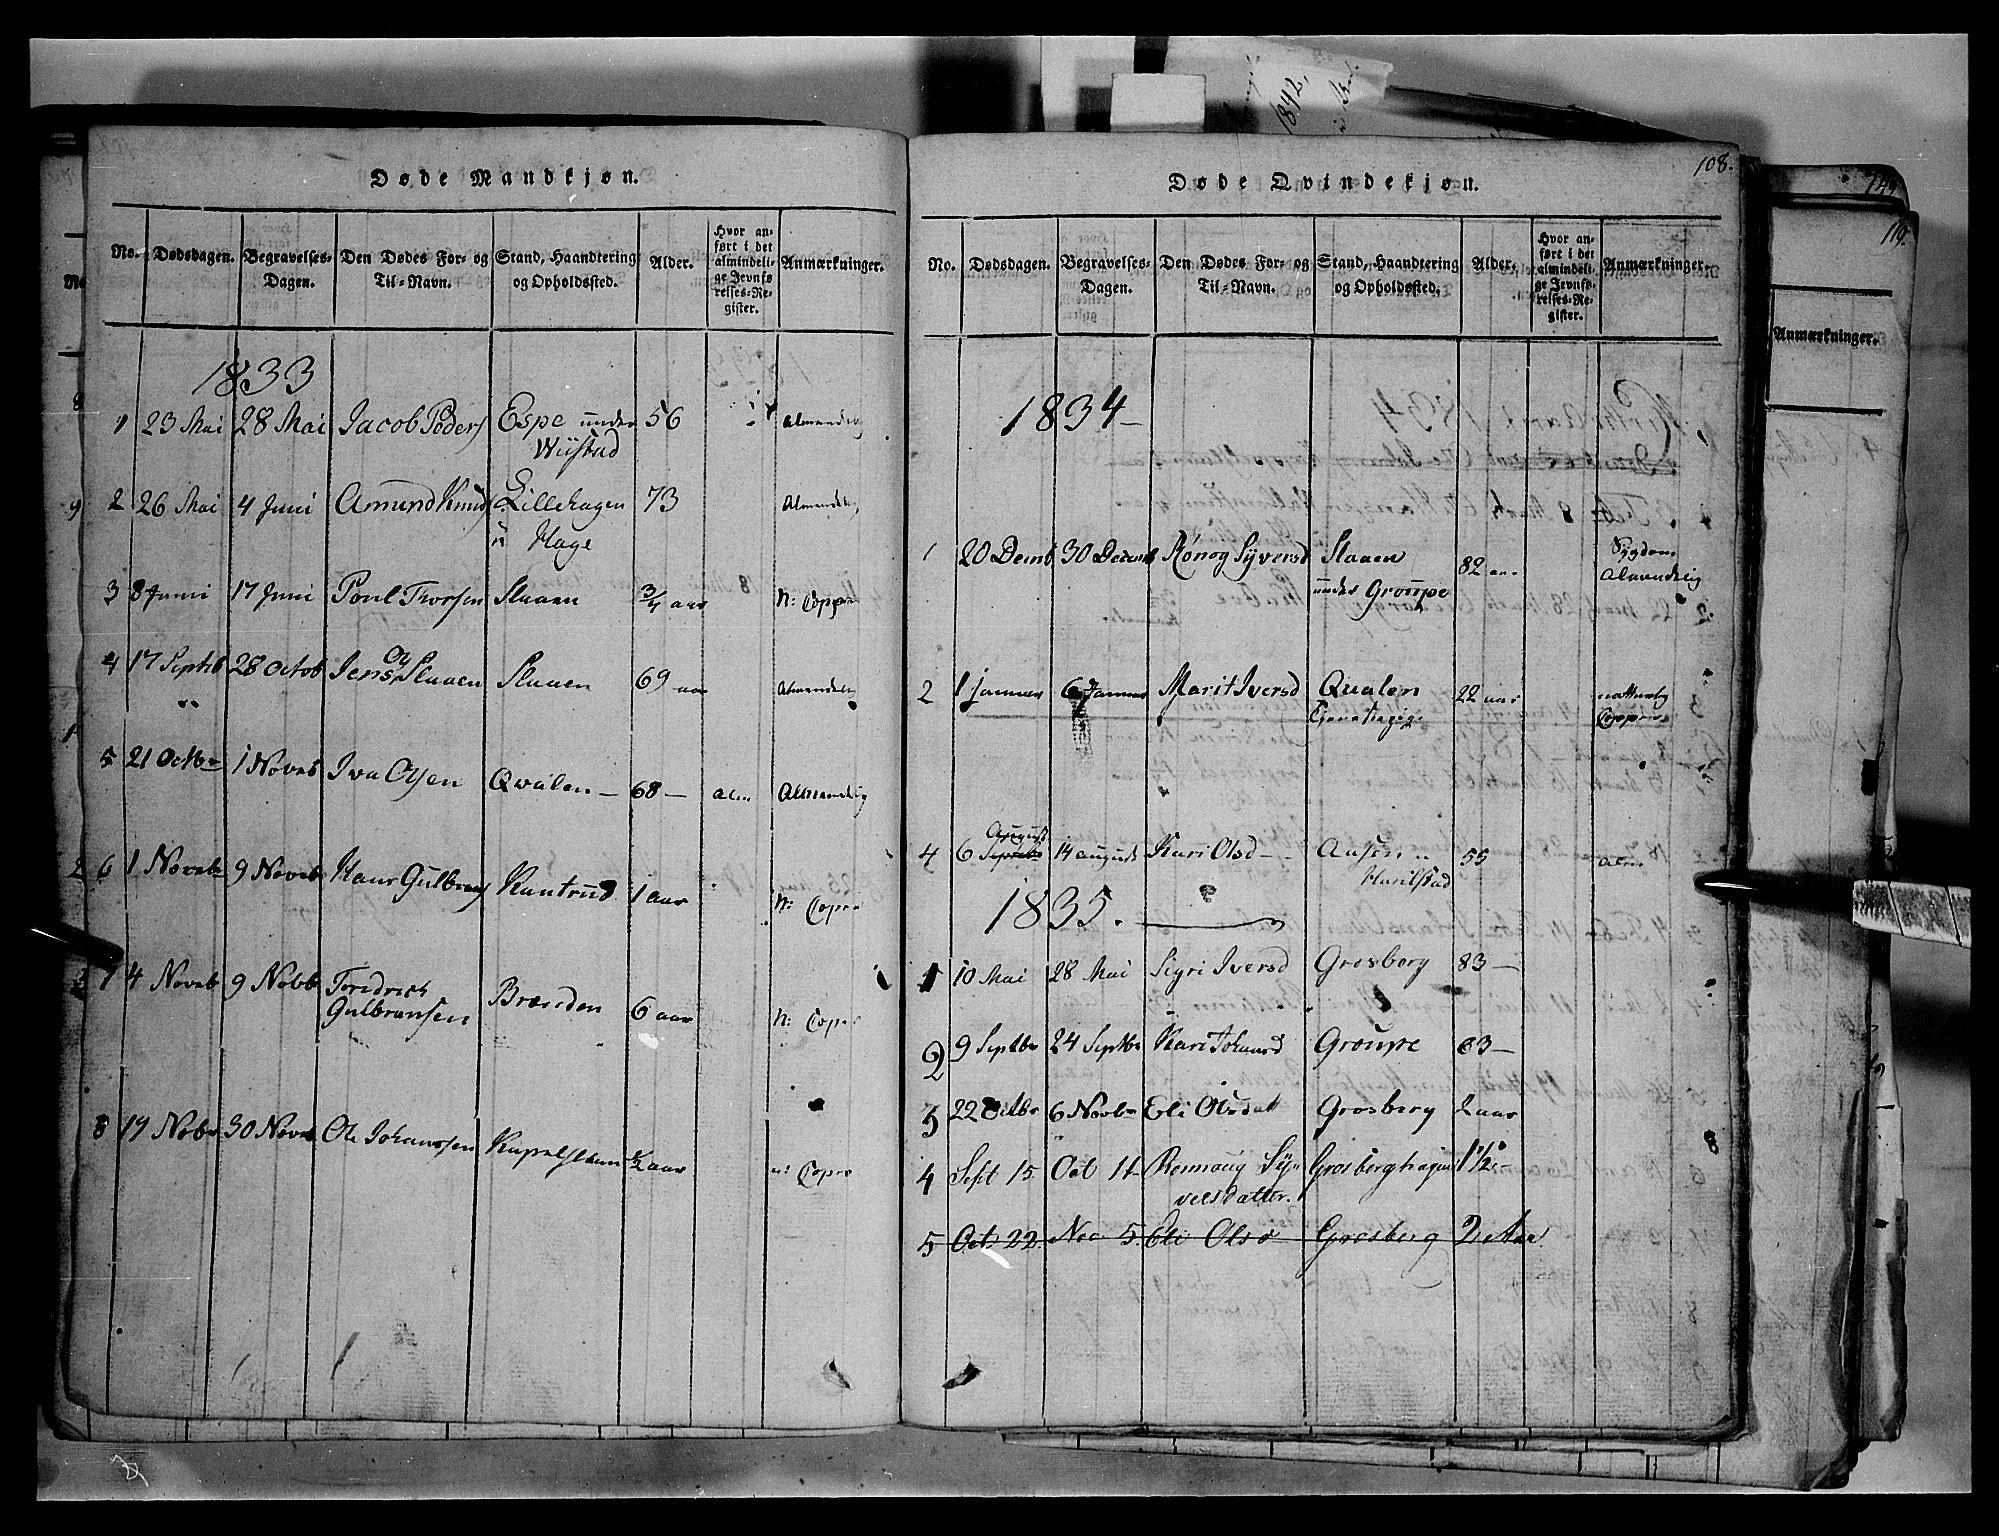 SAH, Fron prestekontor, H/Ha/Hab/L0003: Klokkerbok nr. 3, 1816-1850, s. 108